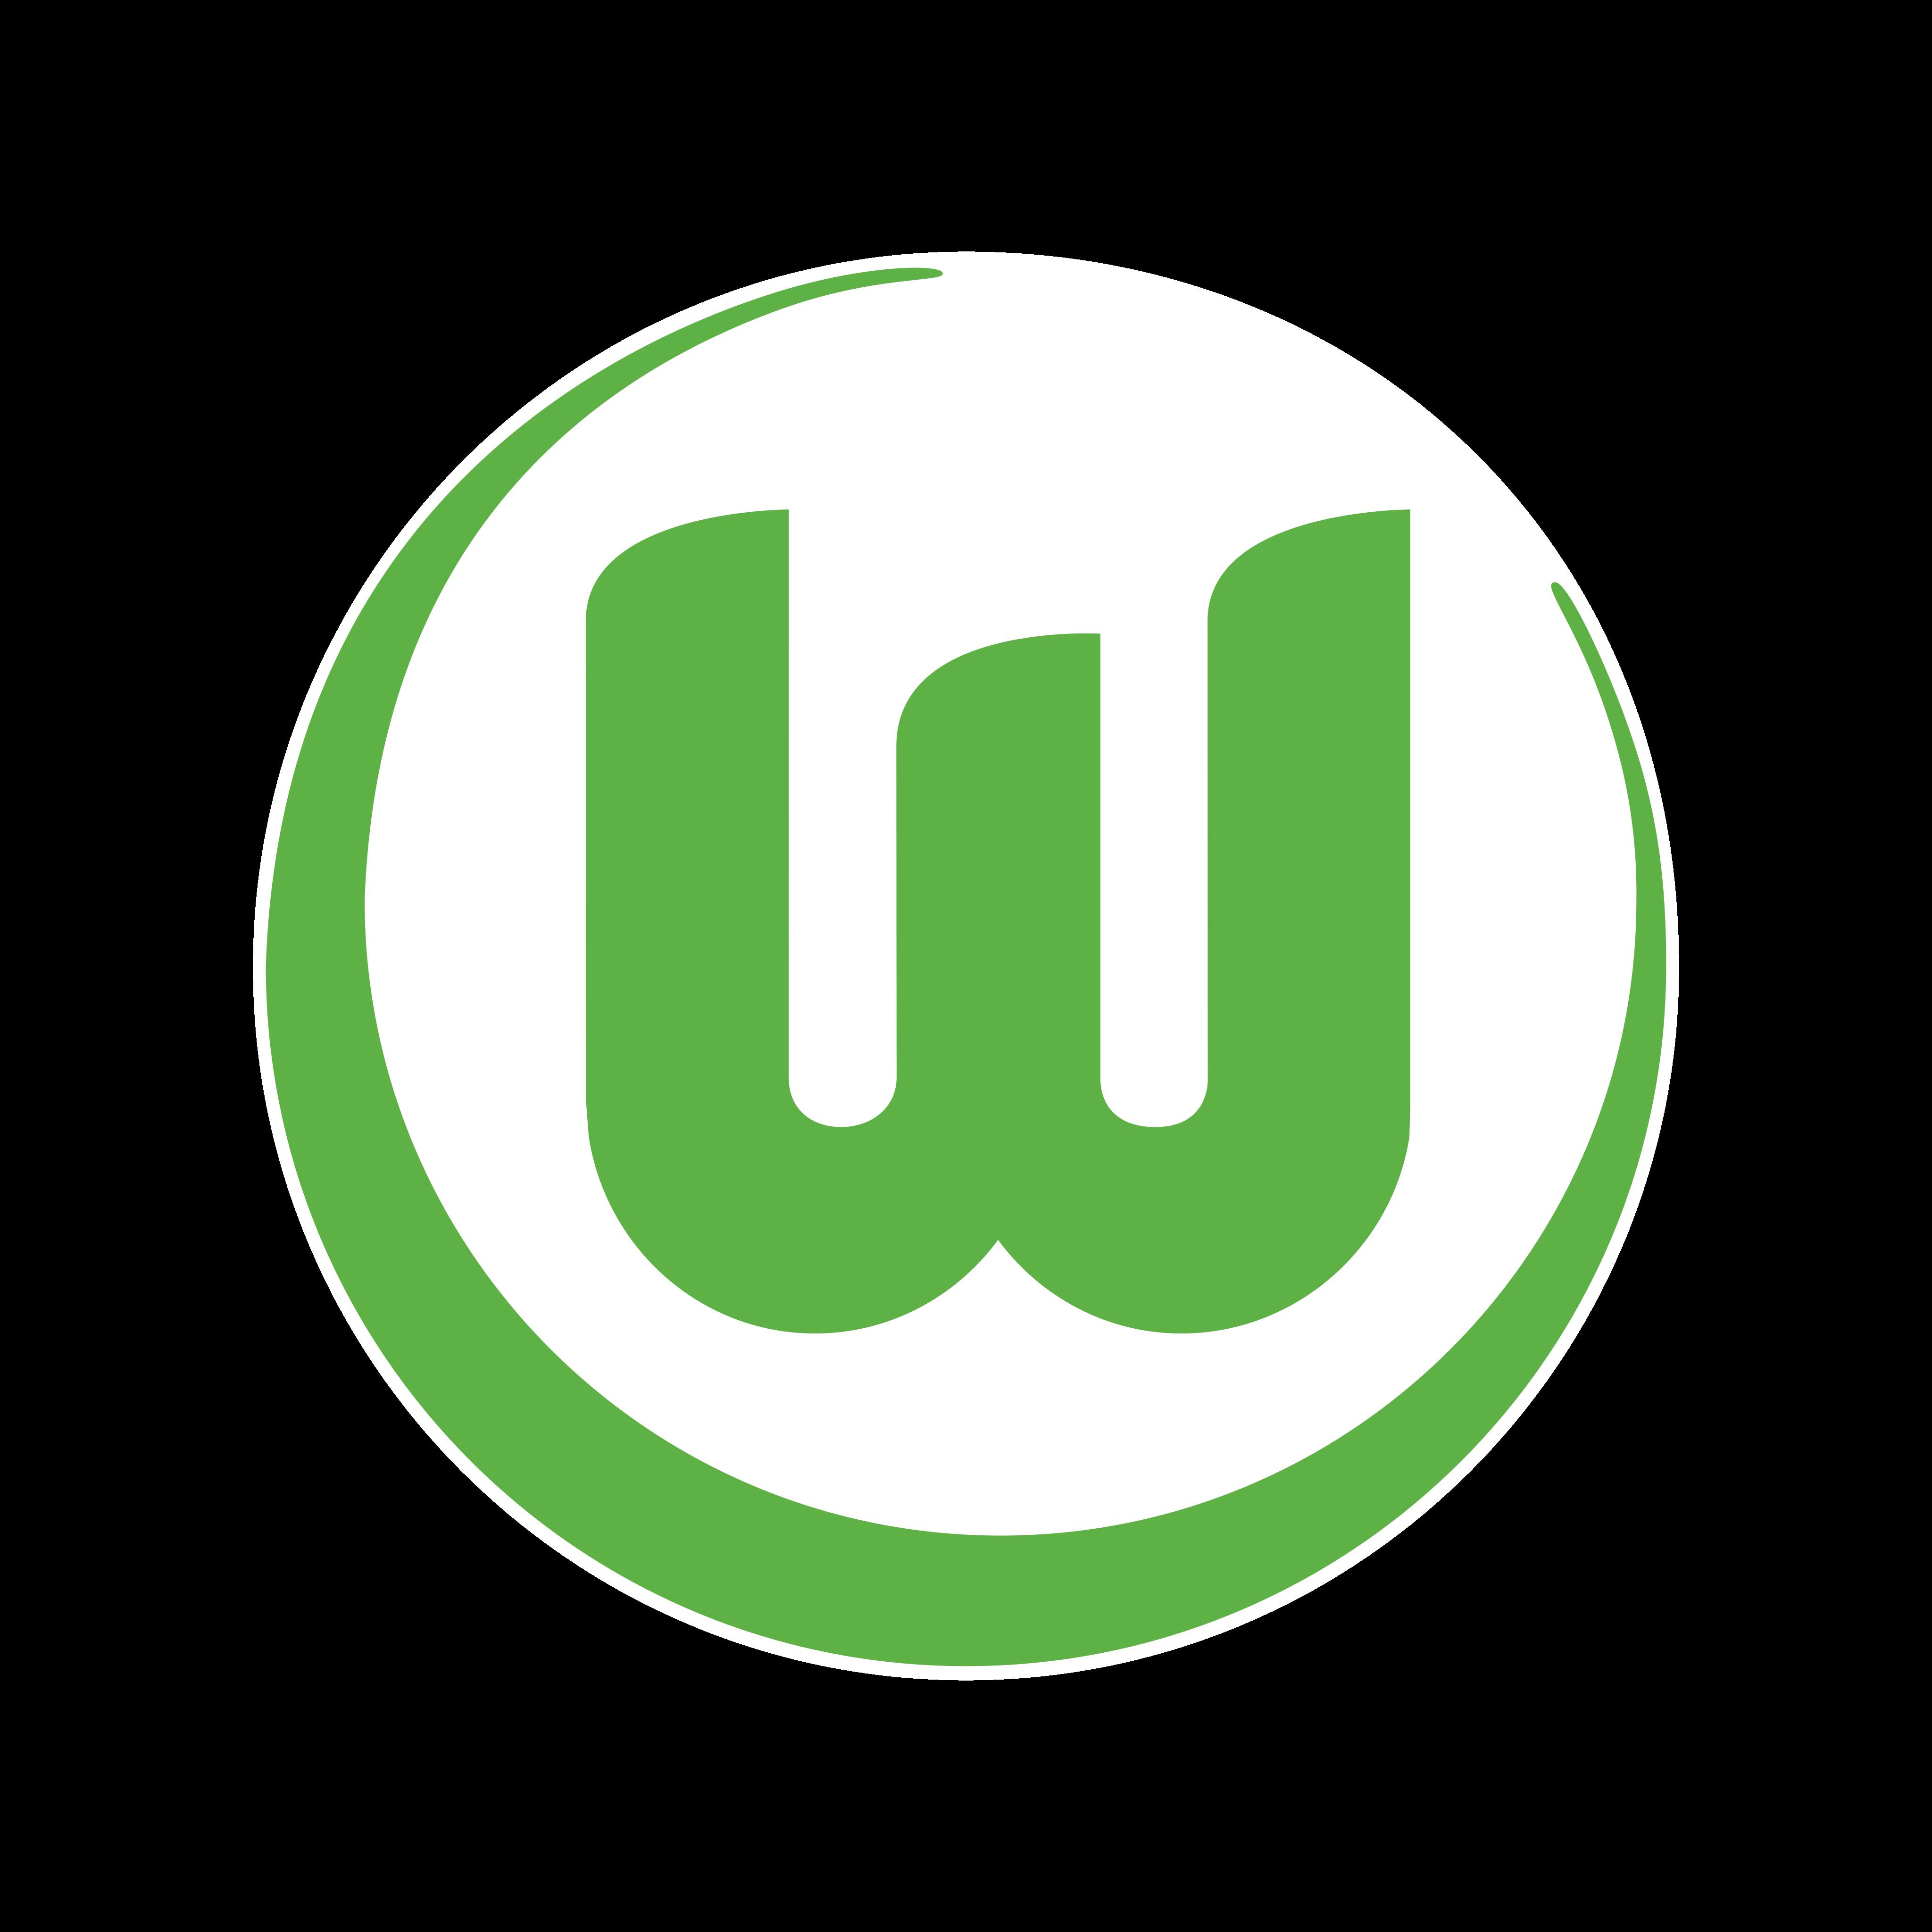 vfl wolfsburg logo 0 - Wolfsburg Logo